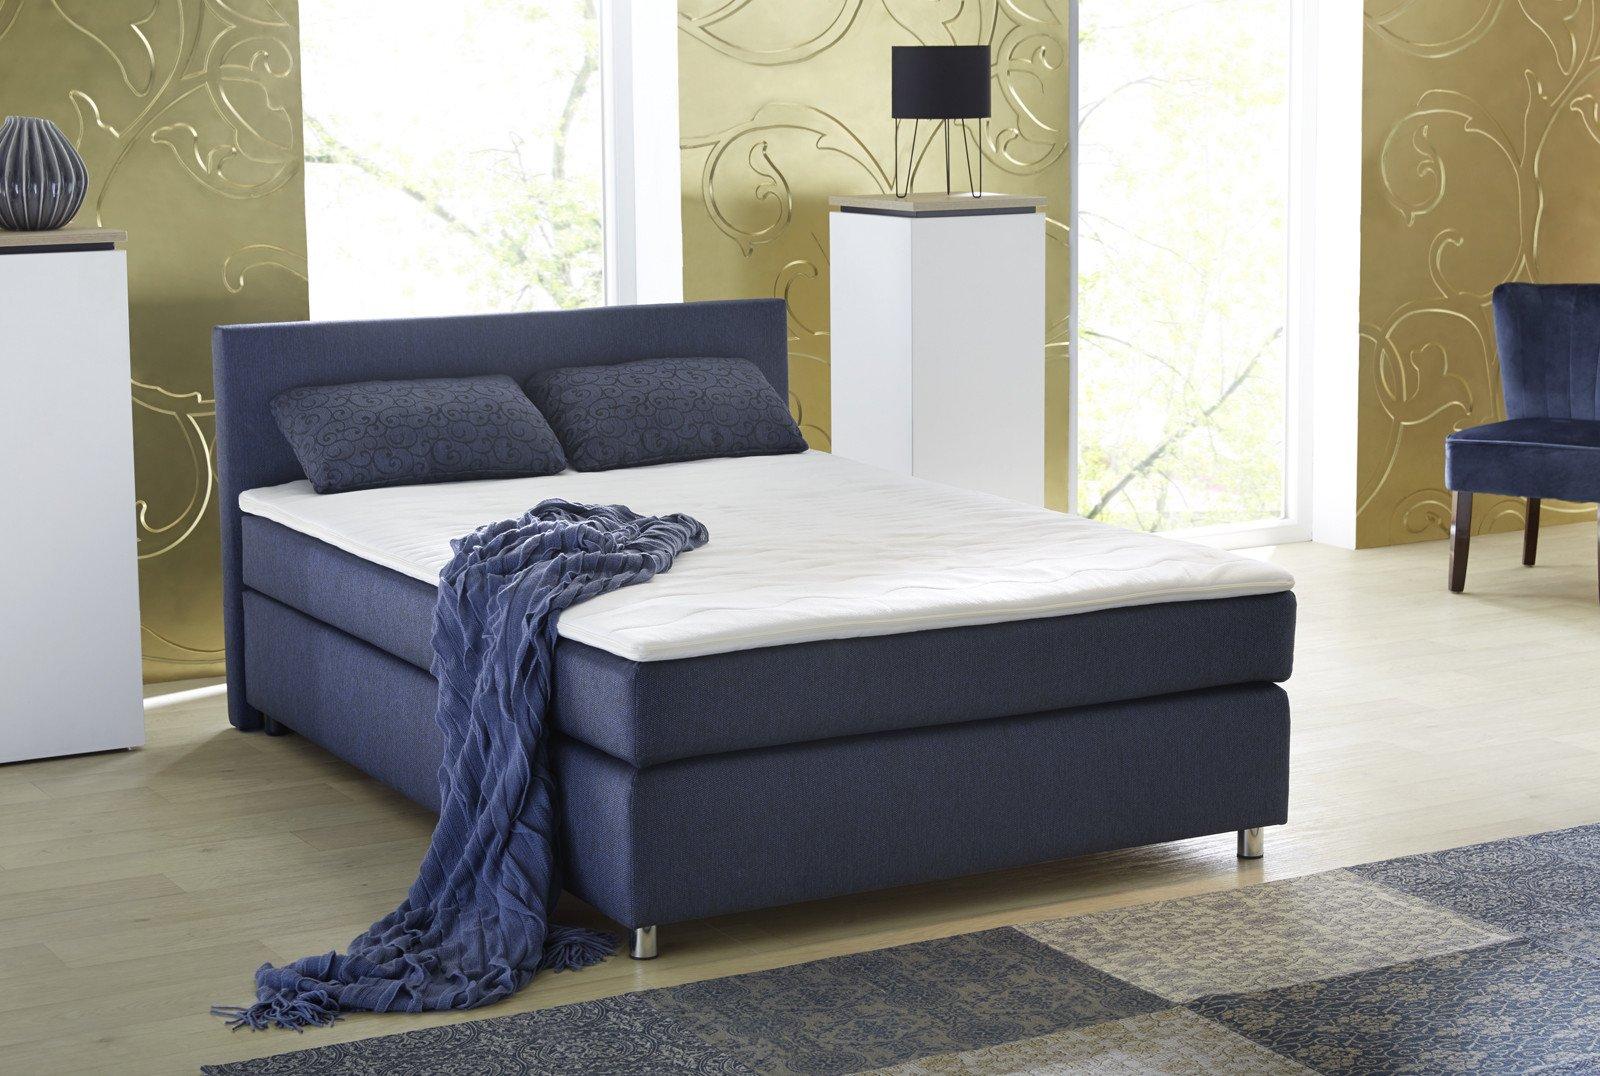 belsonno bettw sche set natur 135 200 cm kissen 80 80 cm 100 baumwolle ko tex standard 100. Black Bedroom Furniture Sets. Home Design Ideas